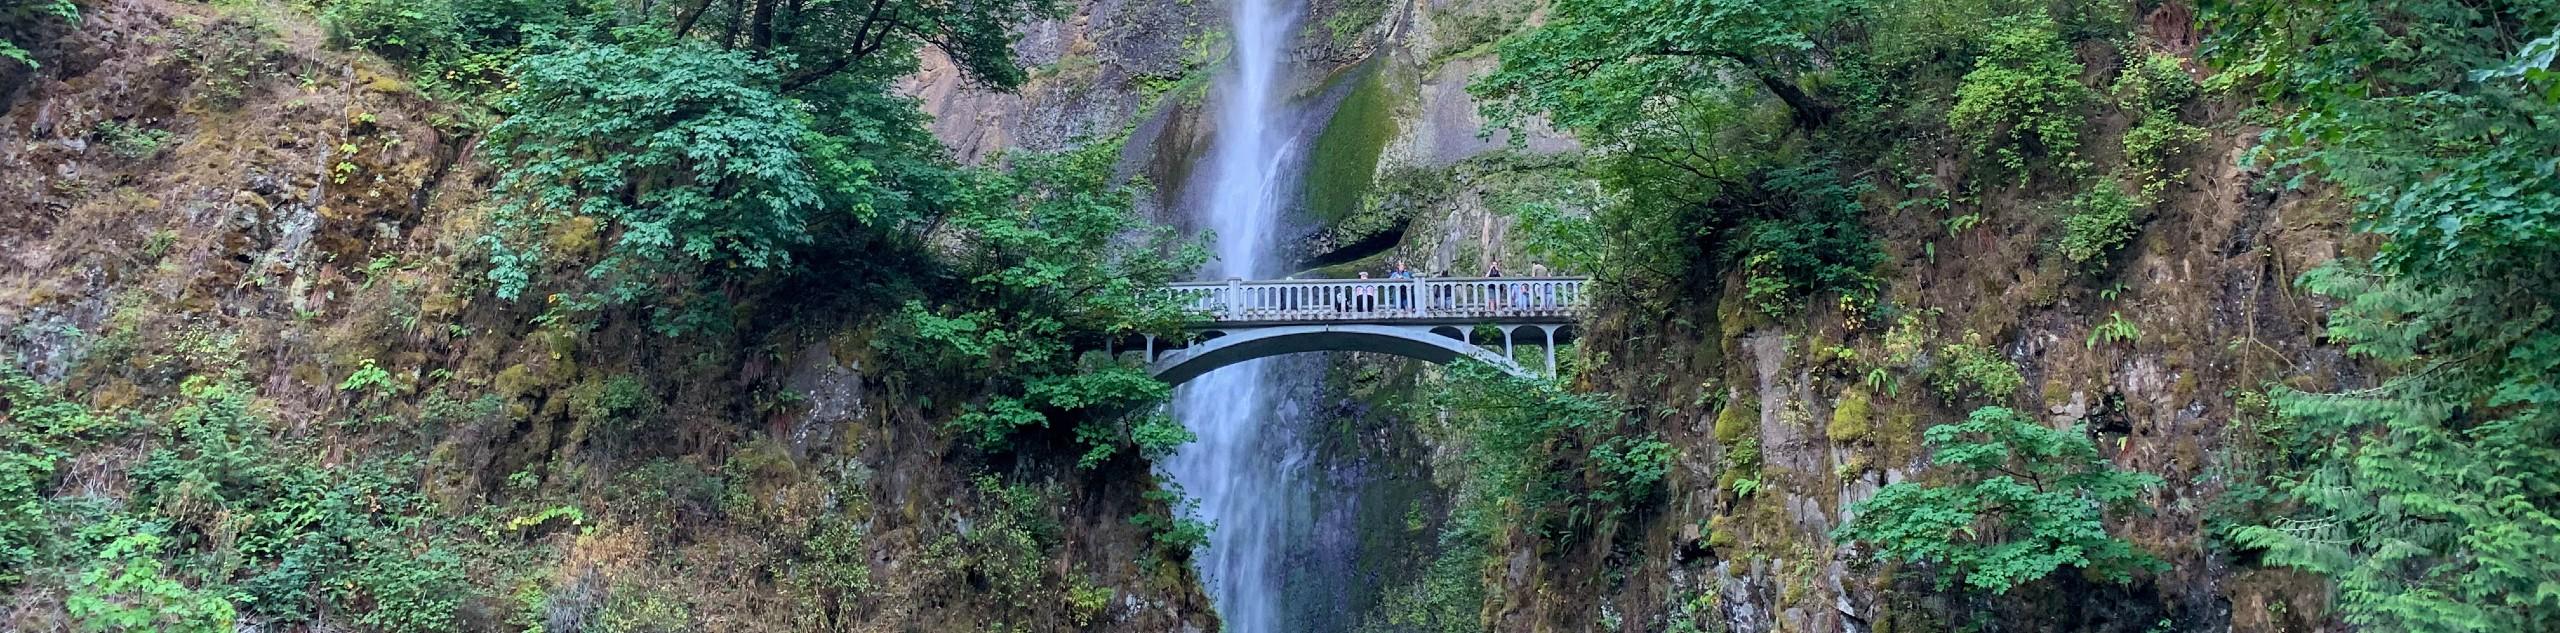 Waterfall and the bridge at Columbia River Gorge, Oregon